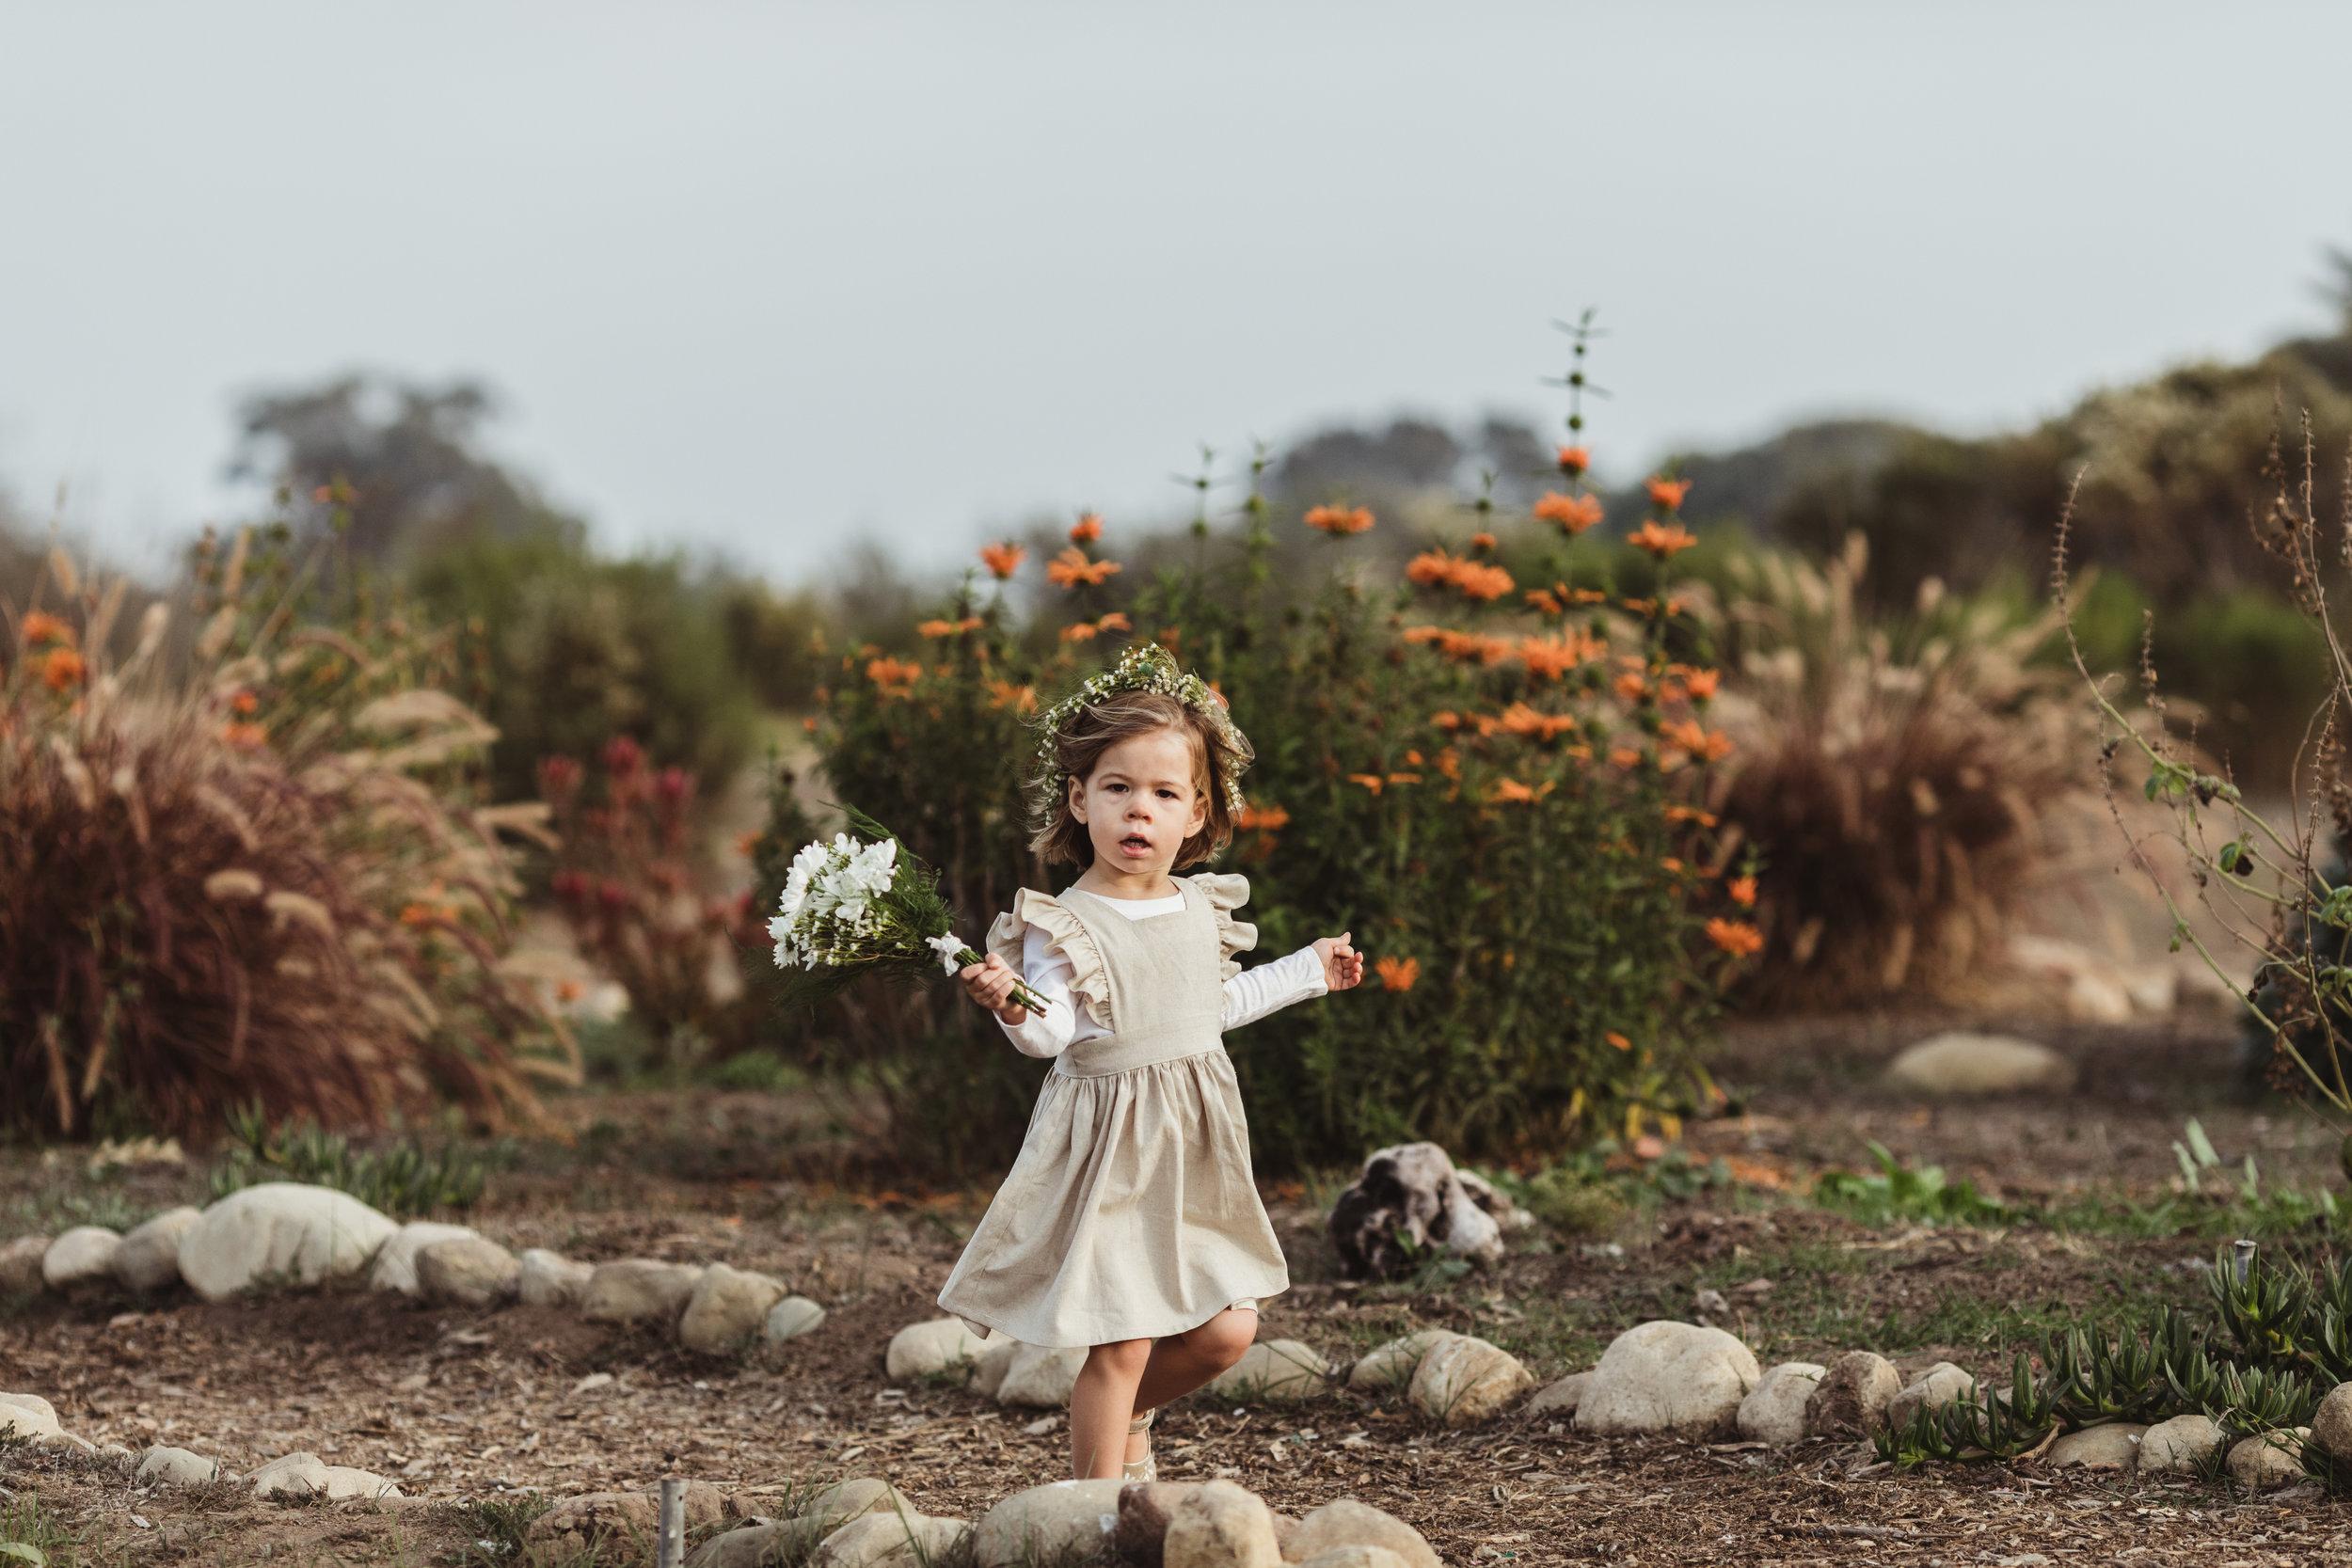 Jamie_English_Photography_JordanErik_Dos_Pueblos_Orchid_Wedding_Santa_Barbara_Fall2018-416.jpg